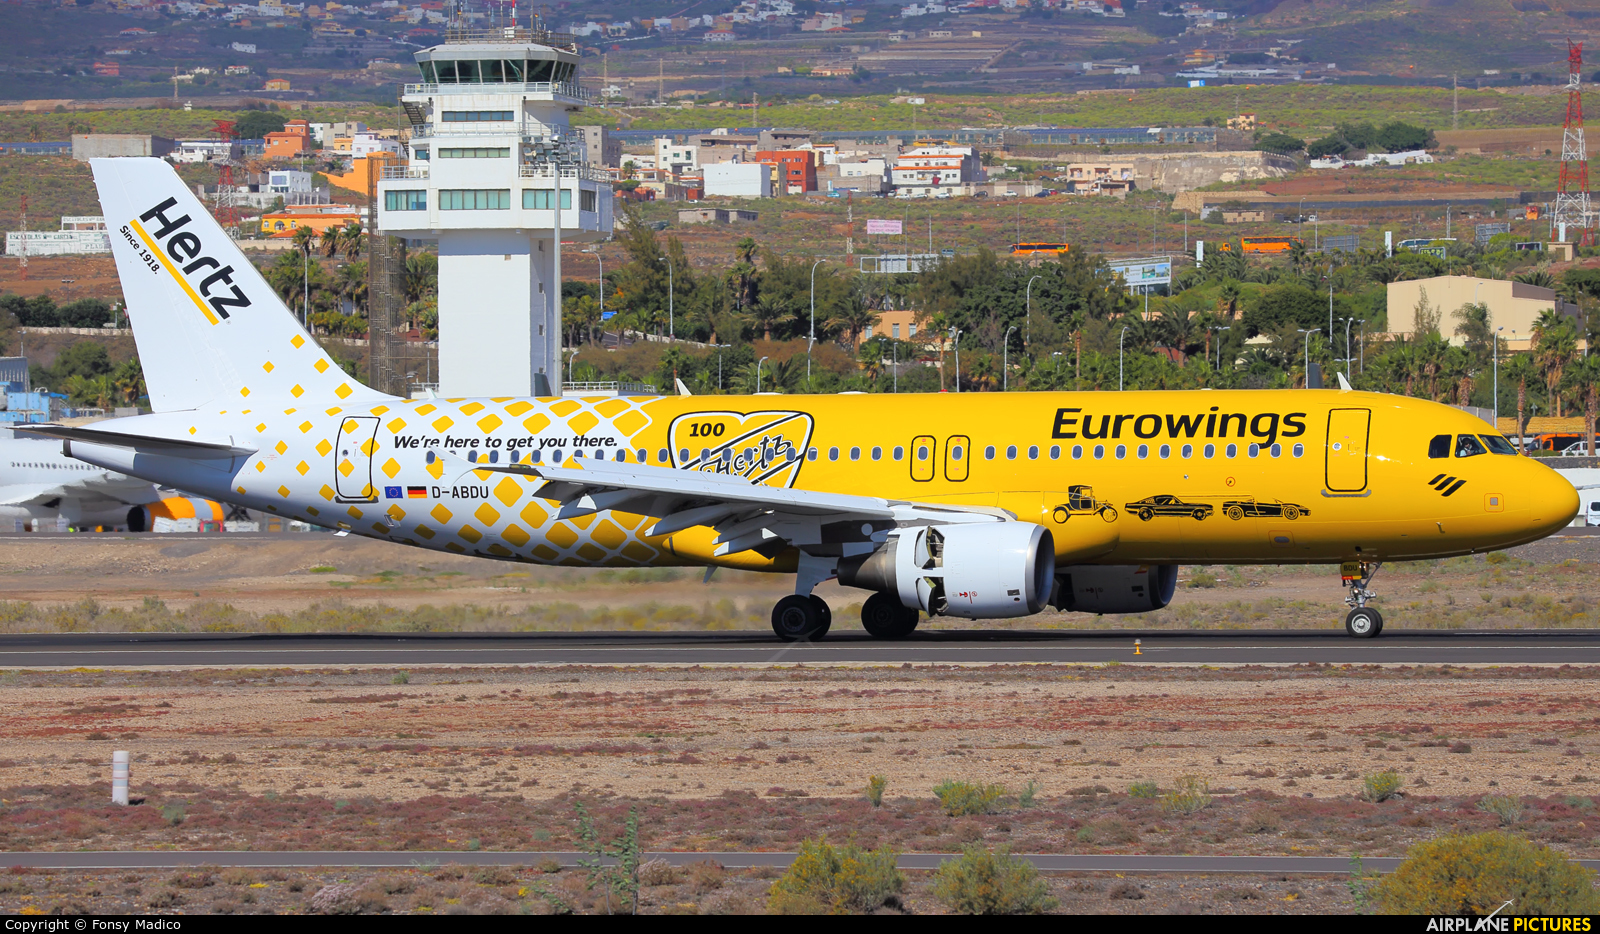 Eurowings D-ABDU aircraft at Tenerife Sur - Reina Sofia